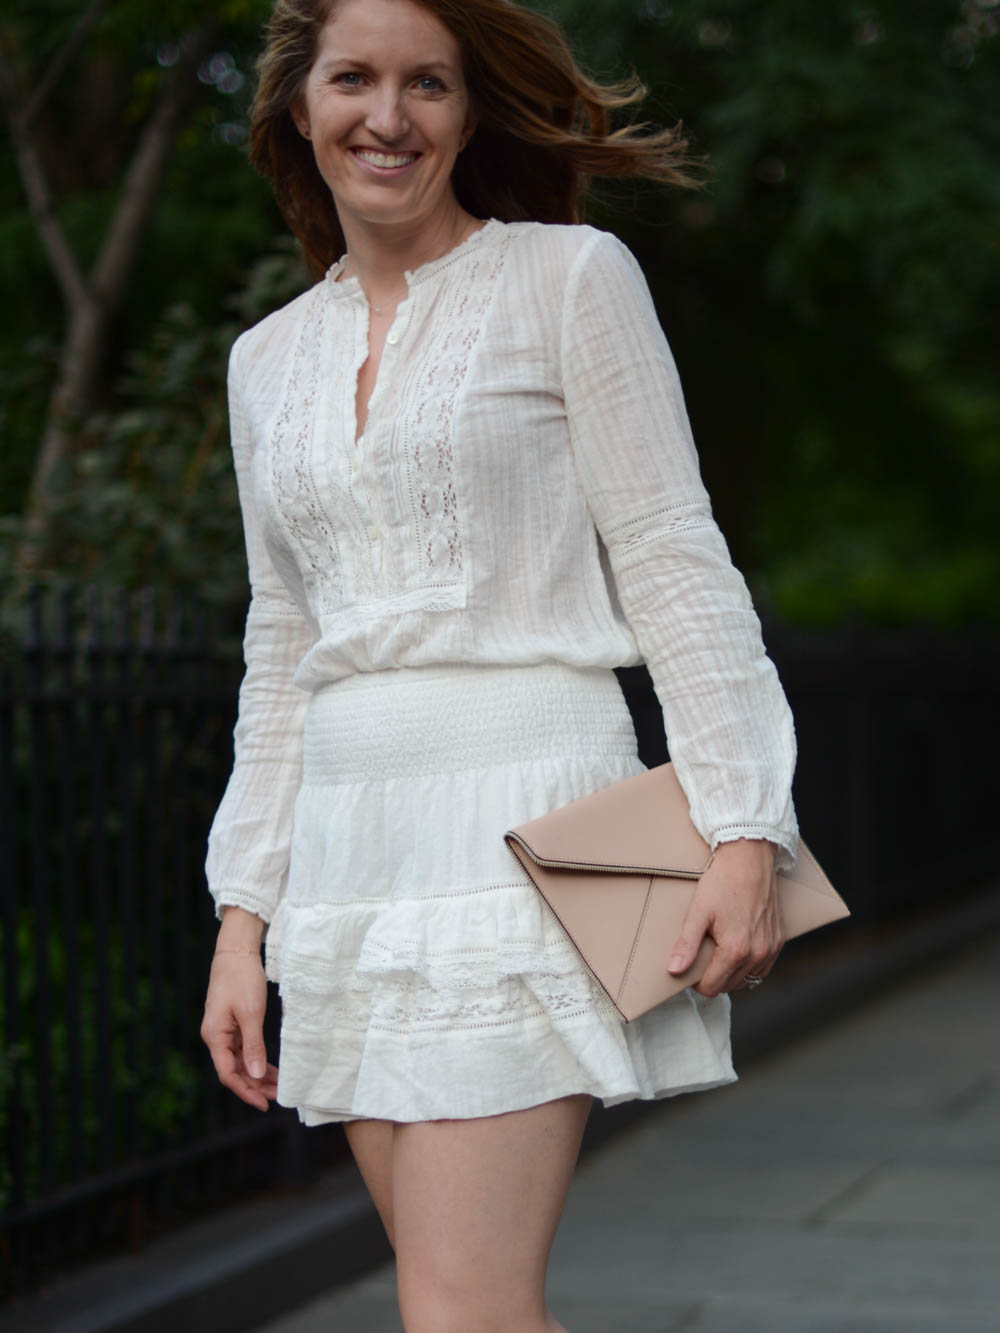 rebecca-taylor-cotton-skirt-blouse.jpg